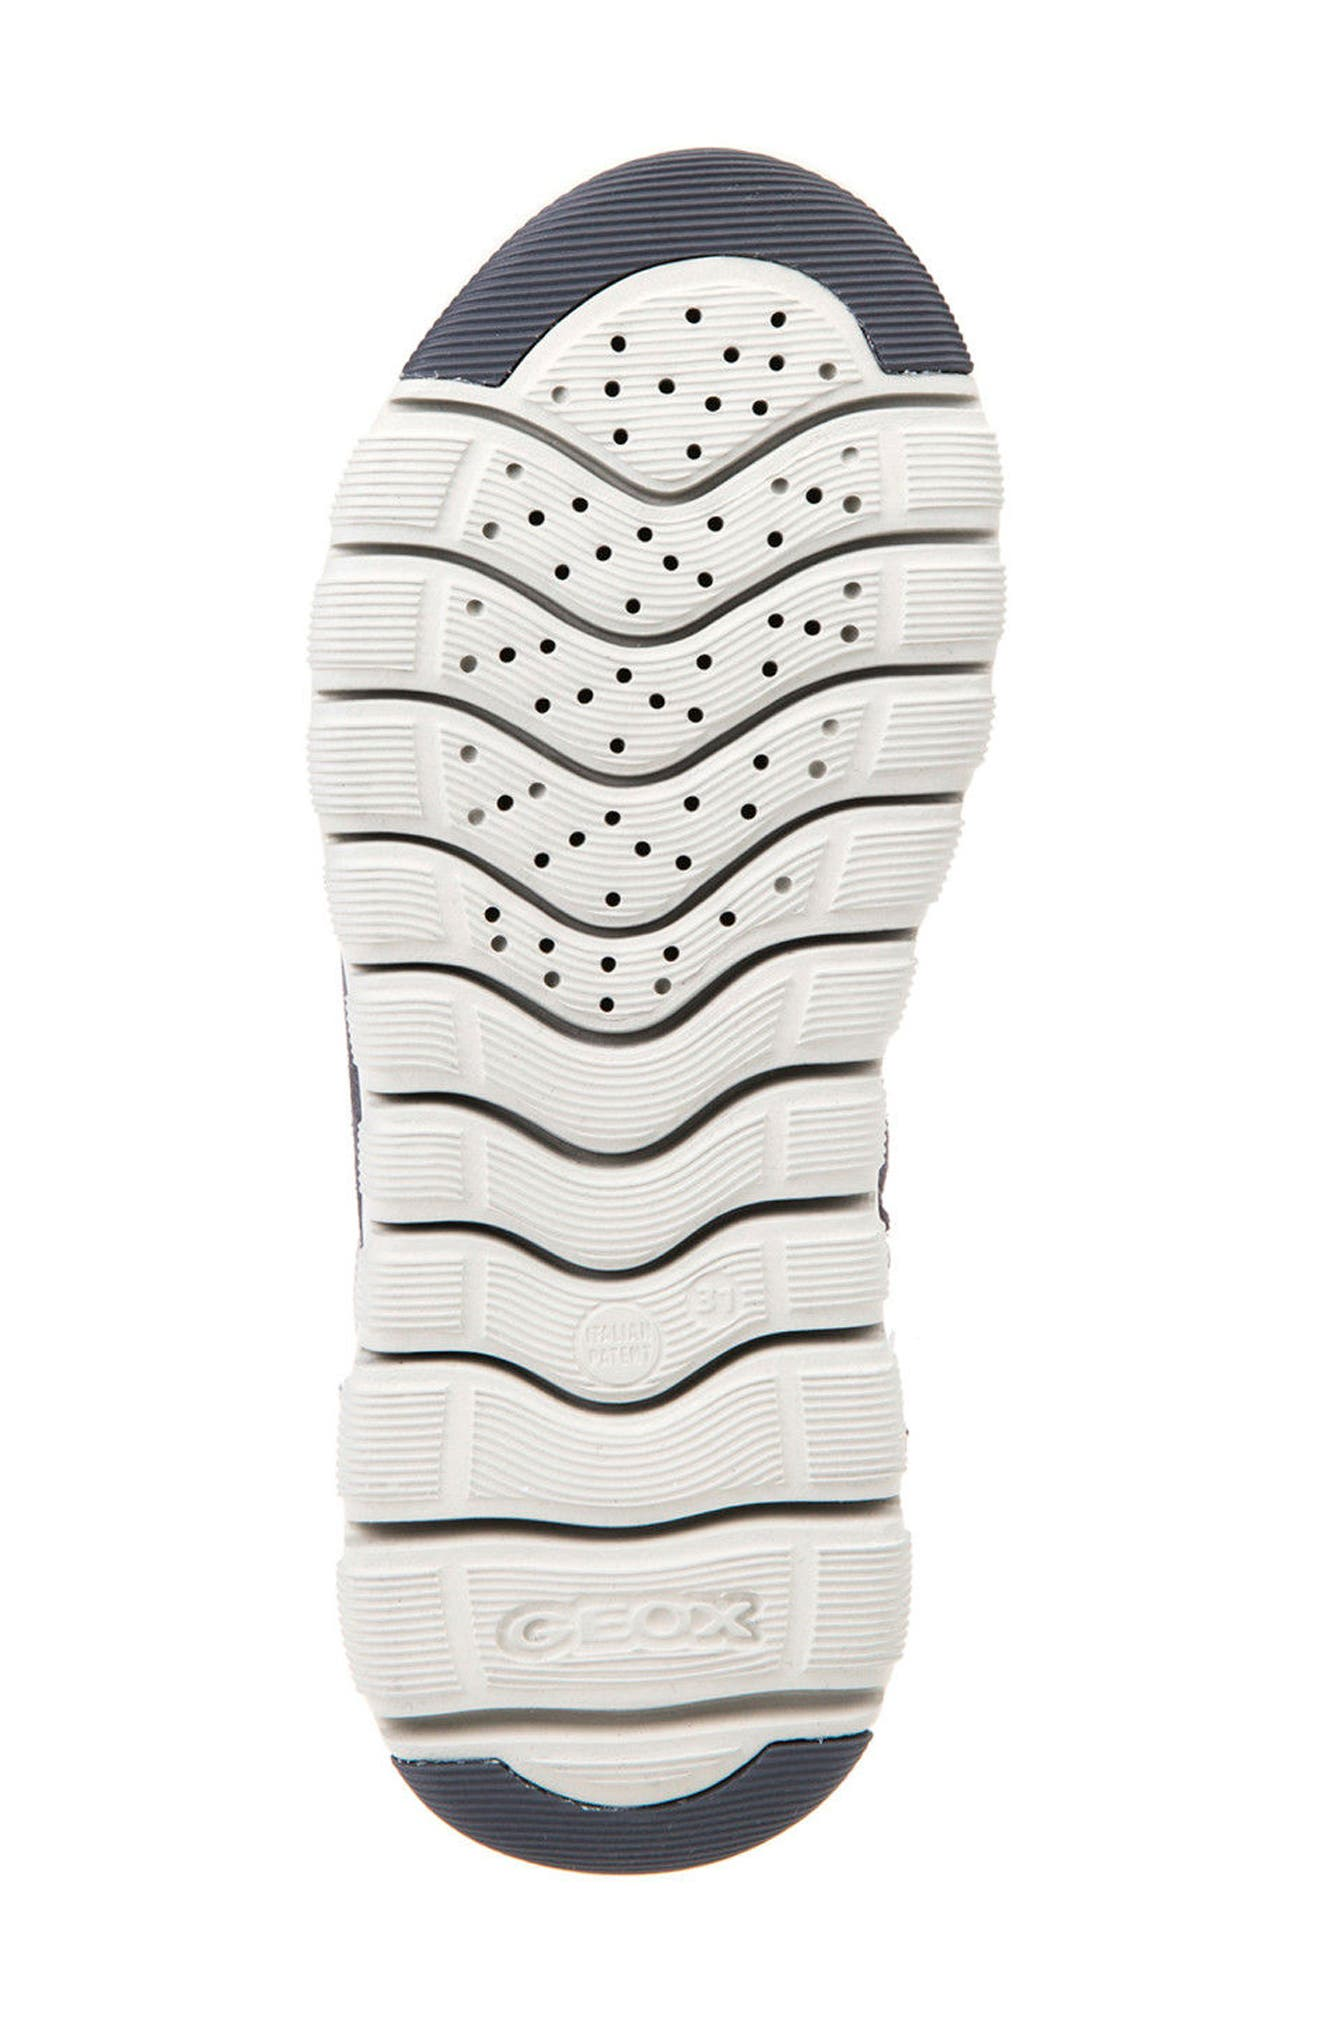 Xunday Mid Top Sneaker,                             Alternate thumbnail 6, color,                             Grey/ Light Grey